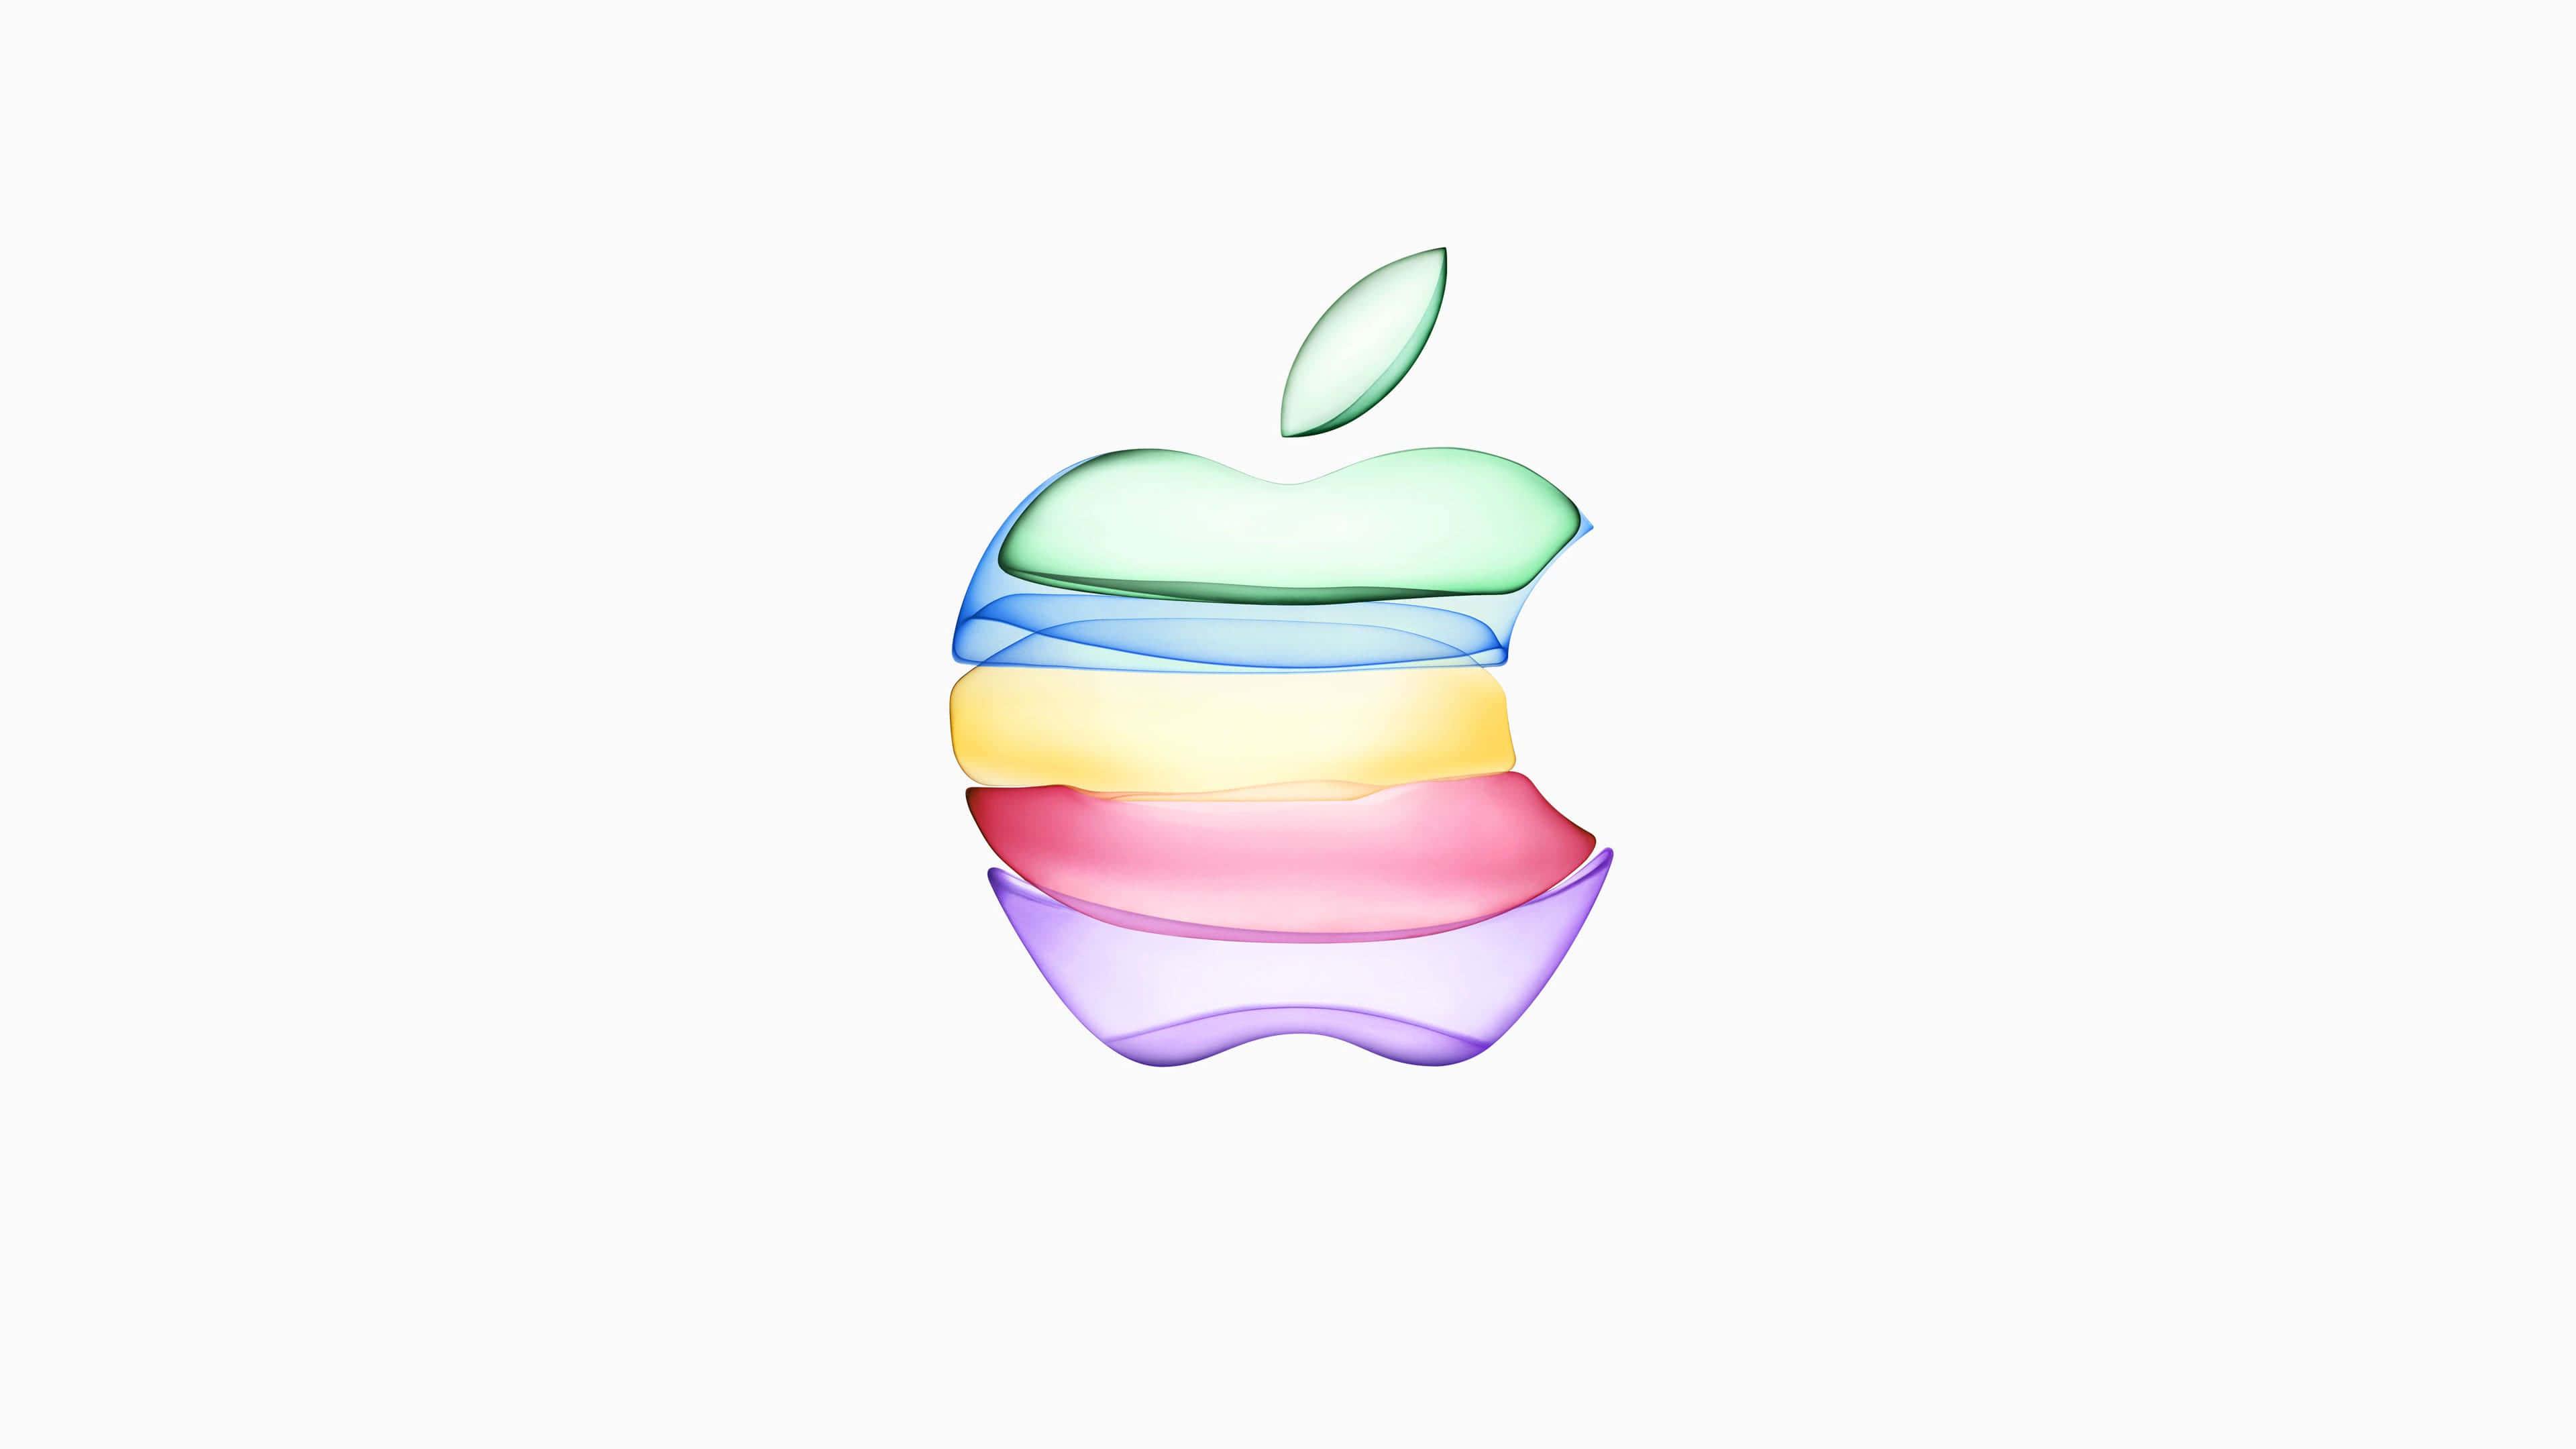 apple 2019 logo uhd 4k wallpaper